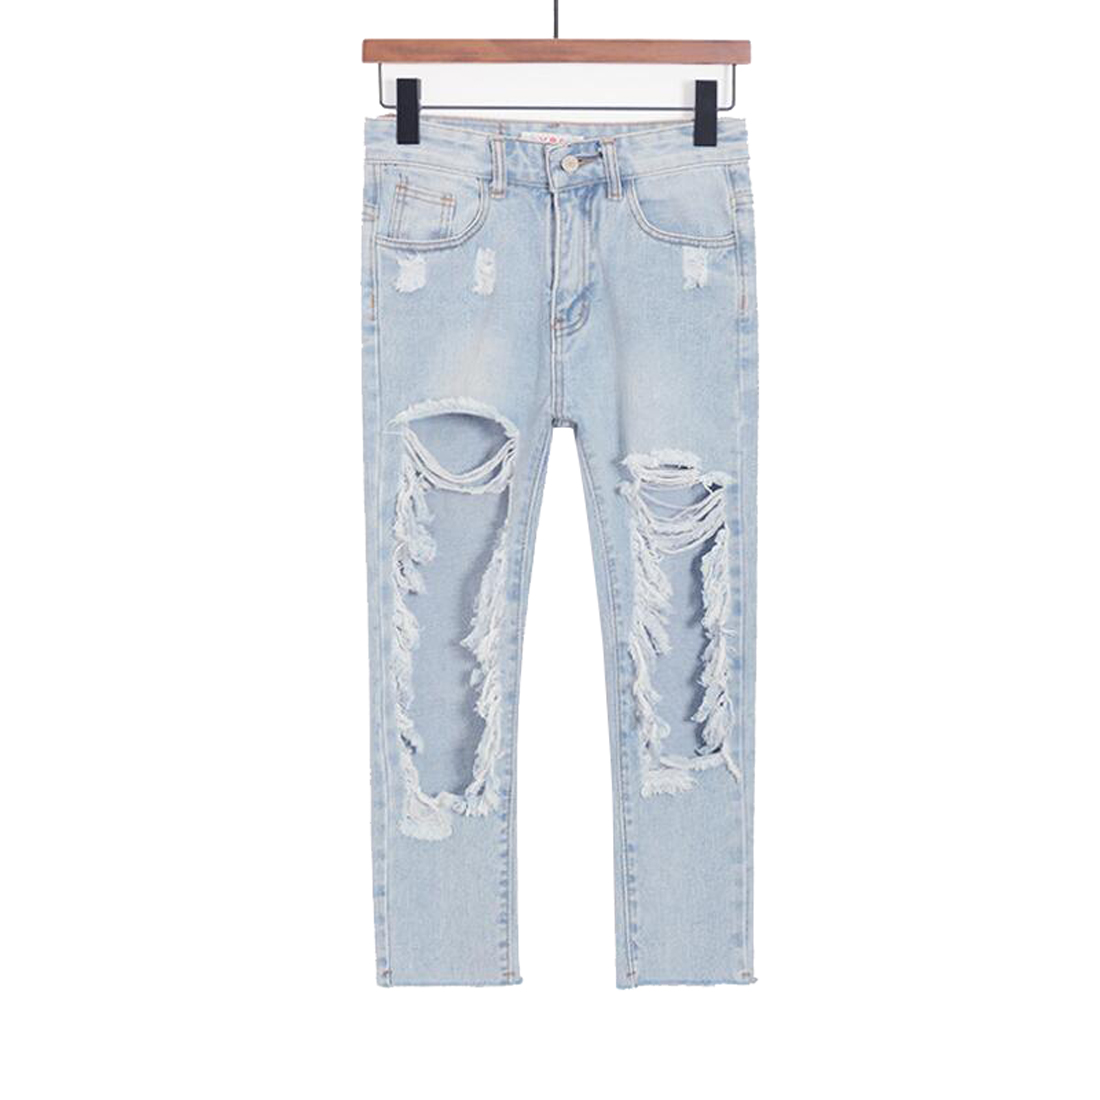 Tengo Hole Jeans Casual Loose Women Slim Jeans